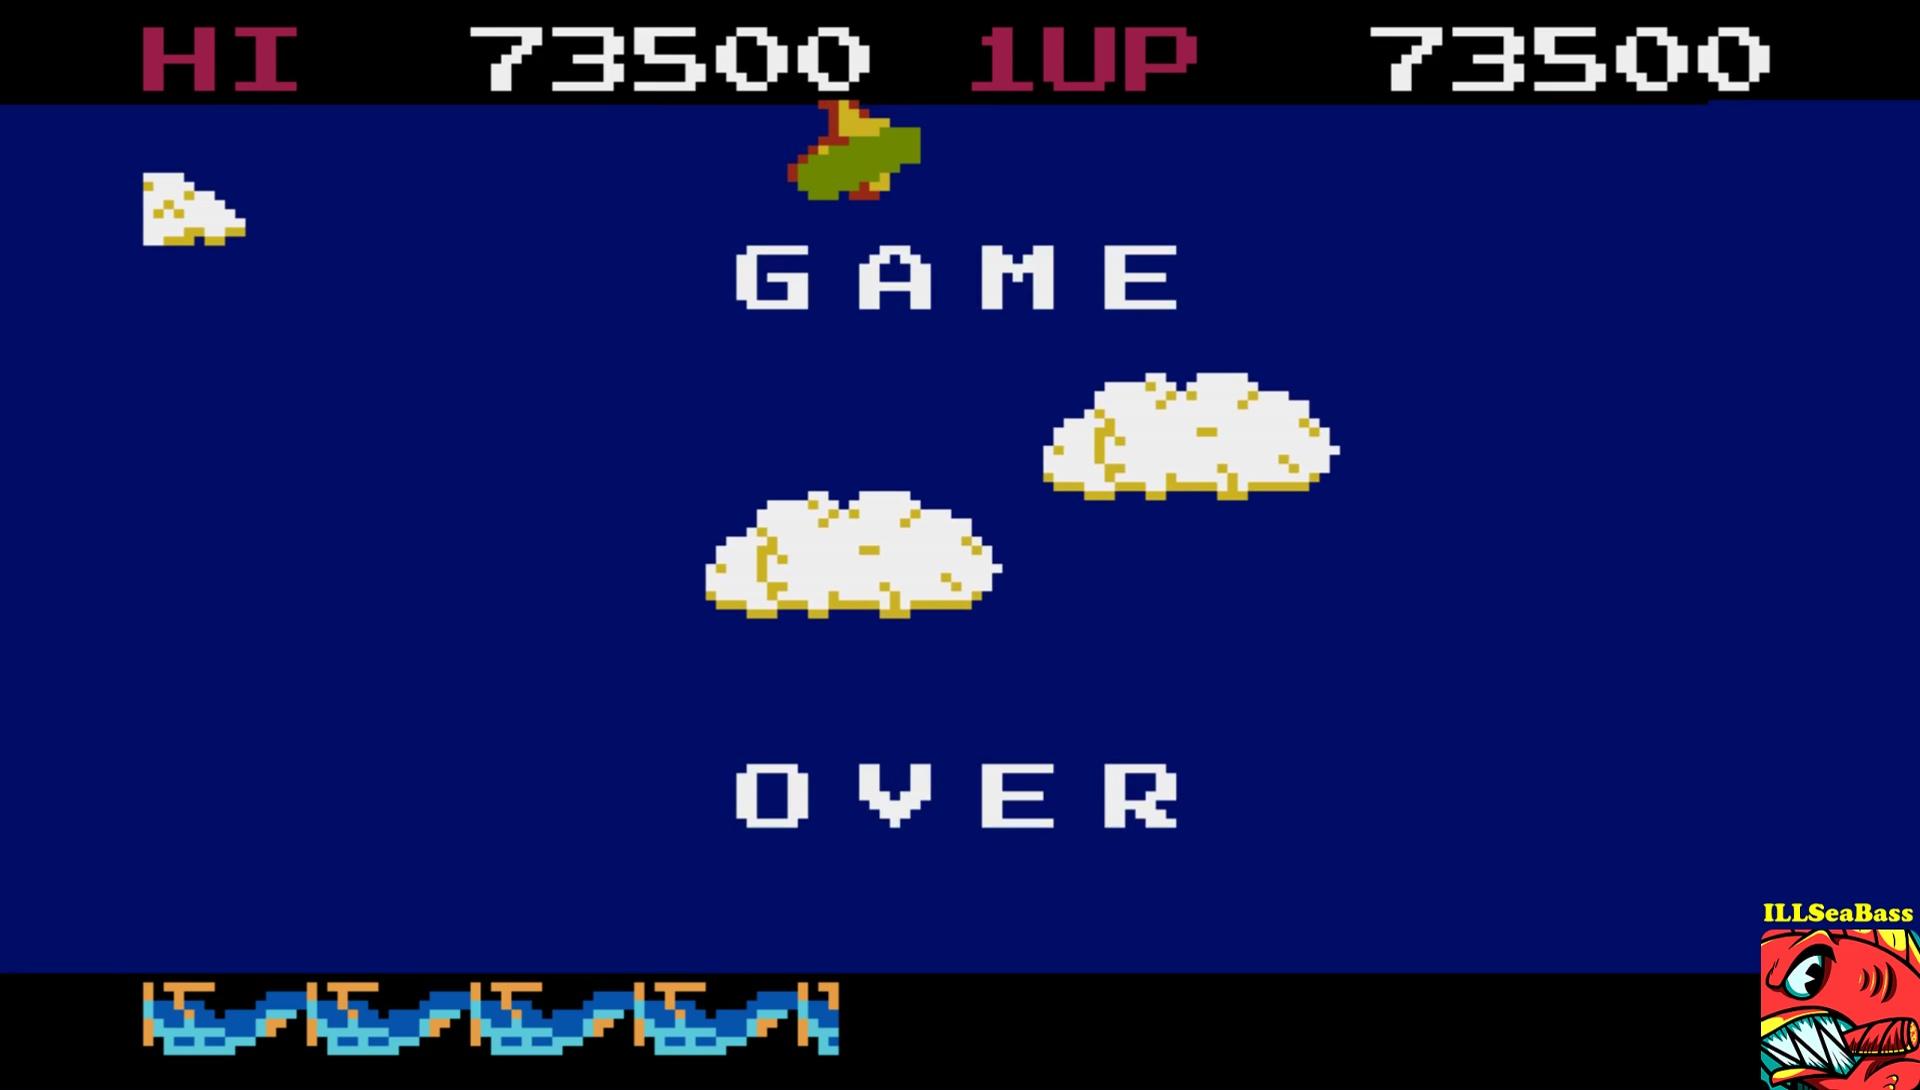 ILLSeaBass: Time Pilot (Atari 400/800/XL/XE Emulated) 73,500 points on 2017-06-03 11:10:38